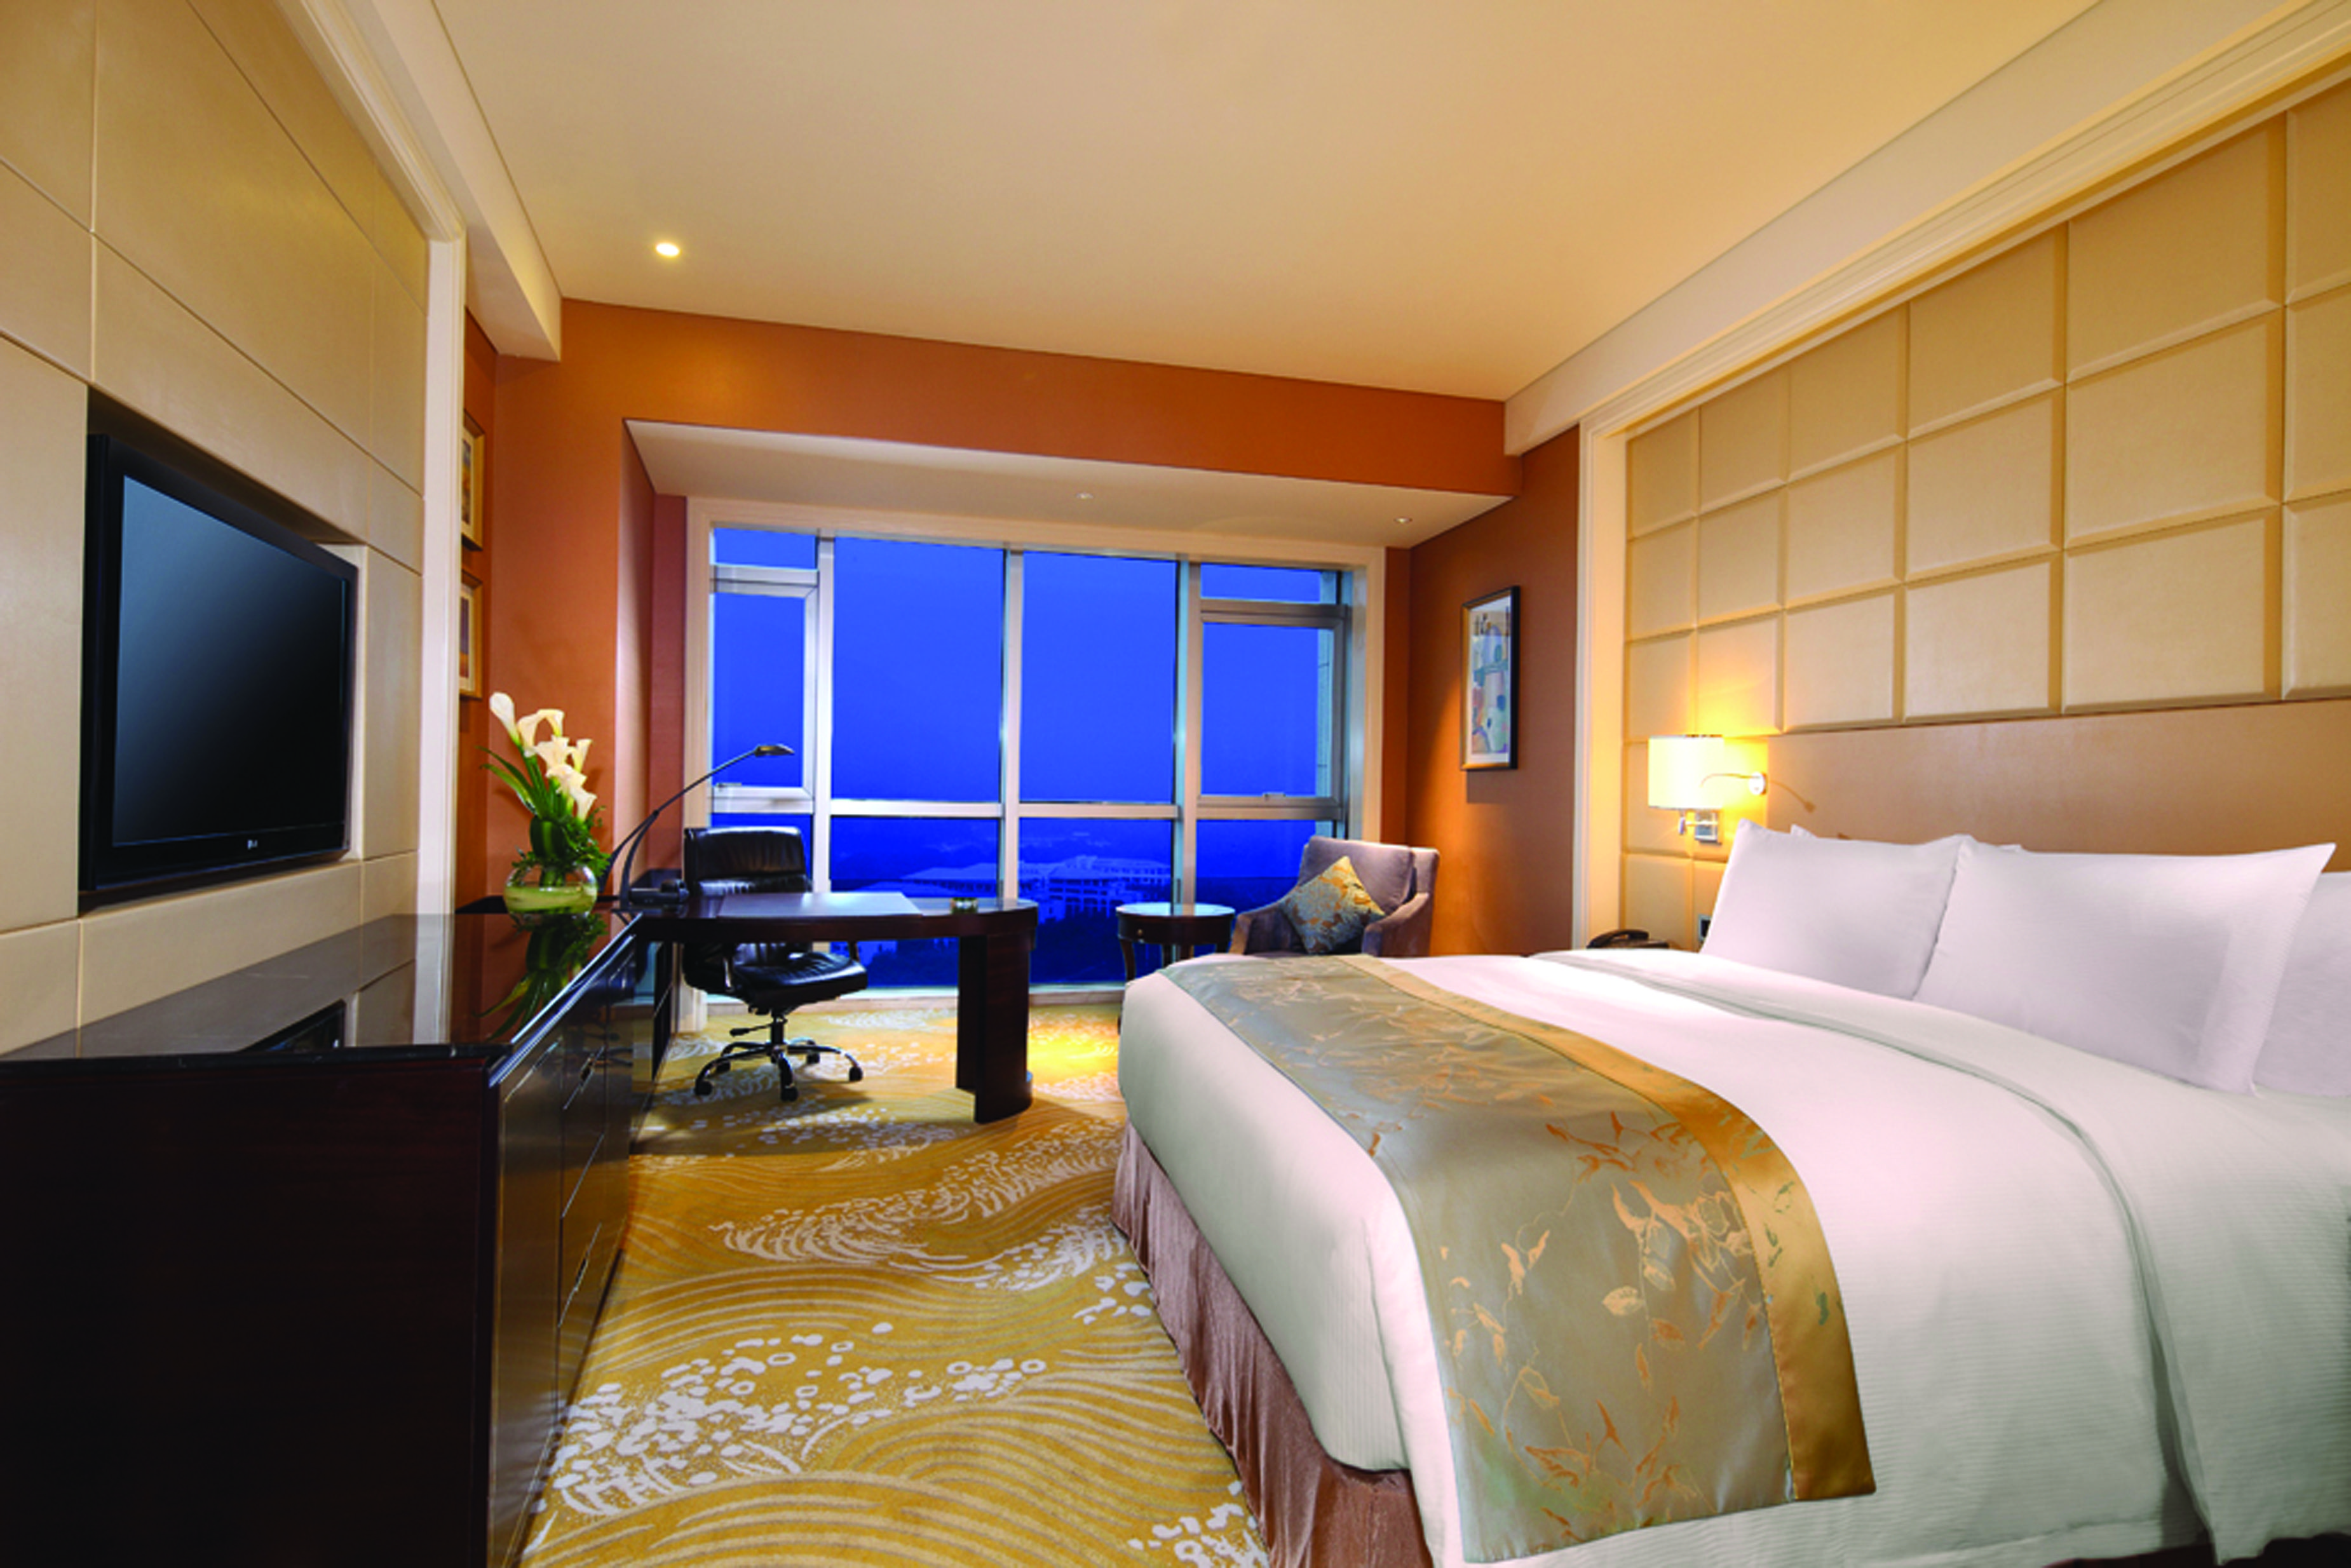 Doubletree Hilton Hotel Hilton Hotel Romantic Hotel